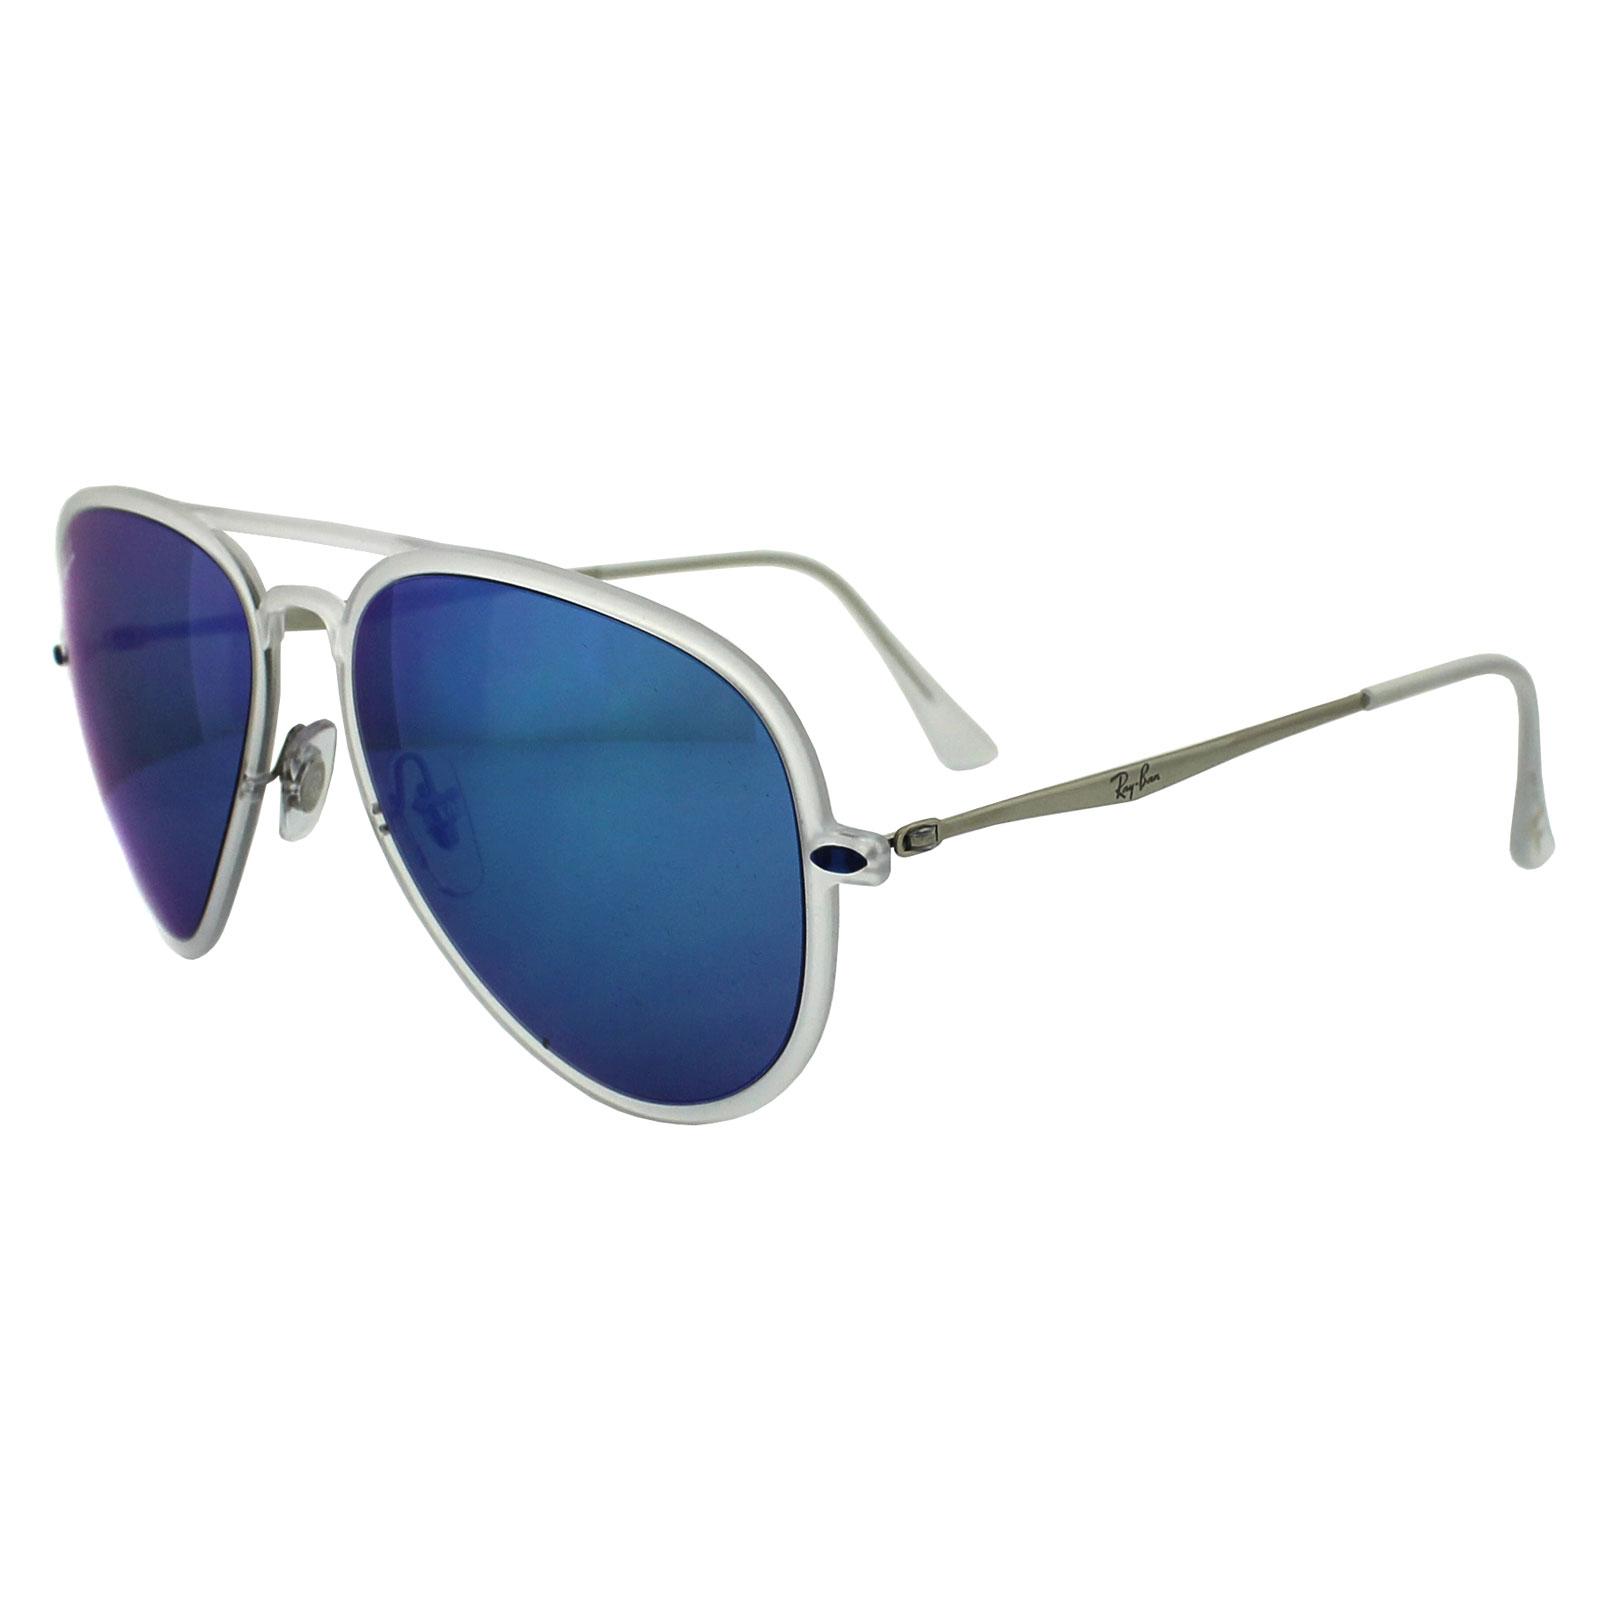 a8123ca6e0 Sentinel Ray-Ban Sunglasses Aviator Light Ray II 4211 646 55 Matt  Transparent Blue Mirror